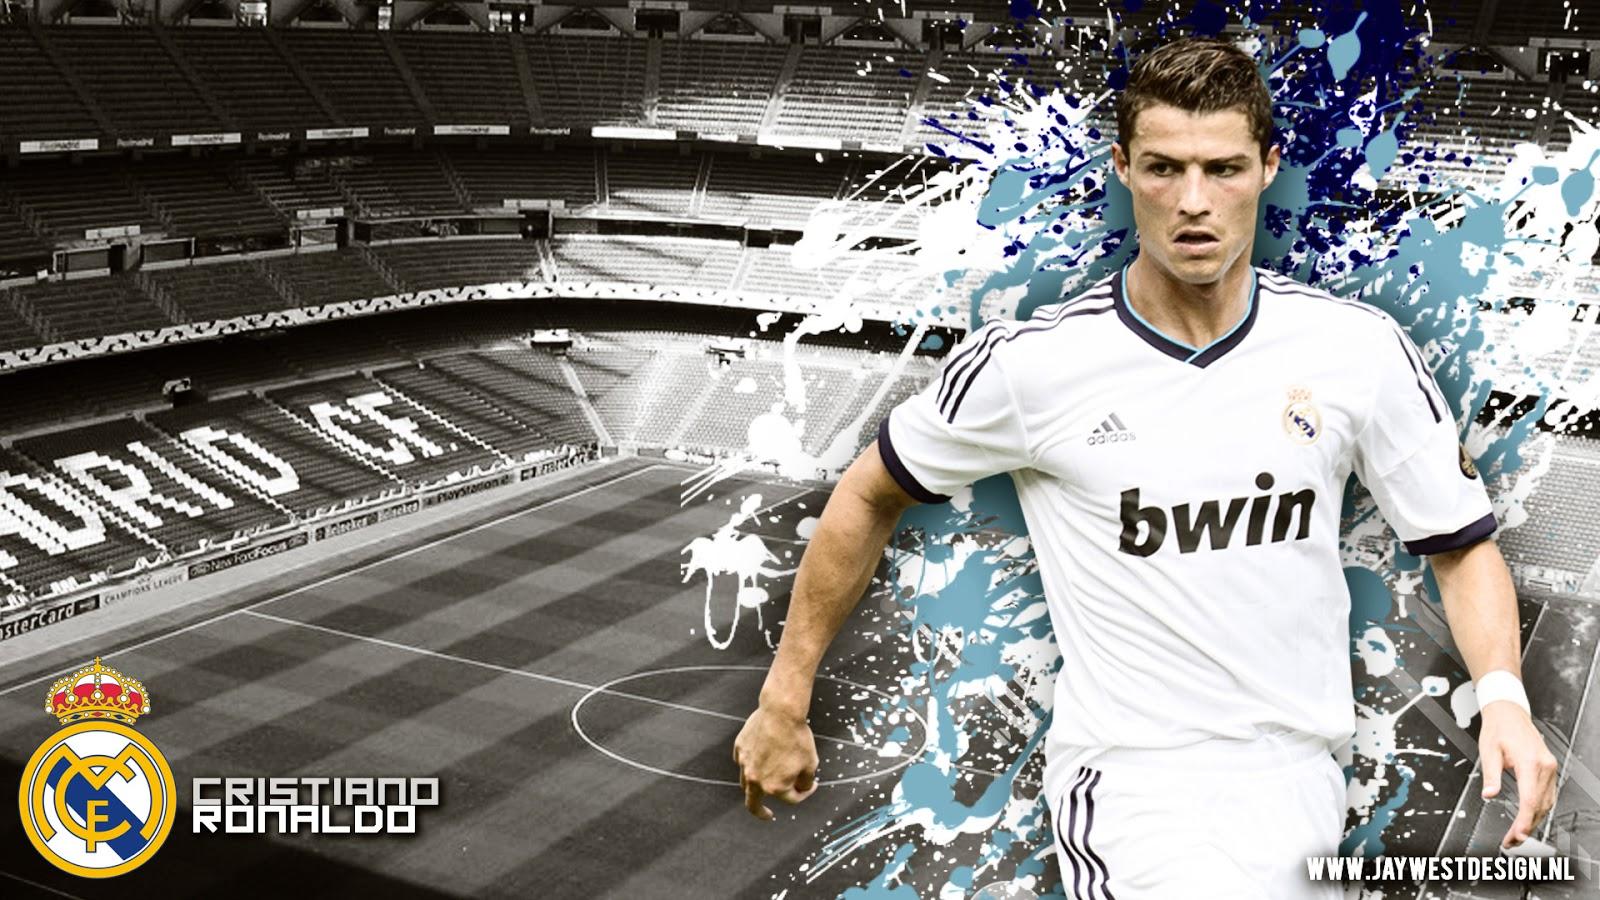 Ronaldo Cristnao Ronaldo Dos Santos Aviero Wallpapers Fond decran 1600x900